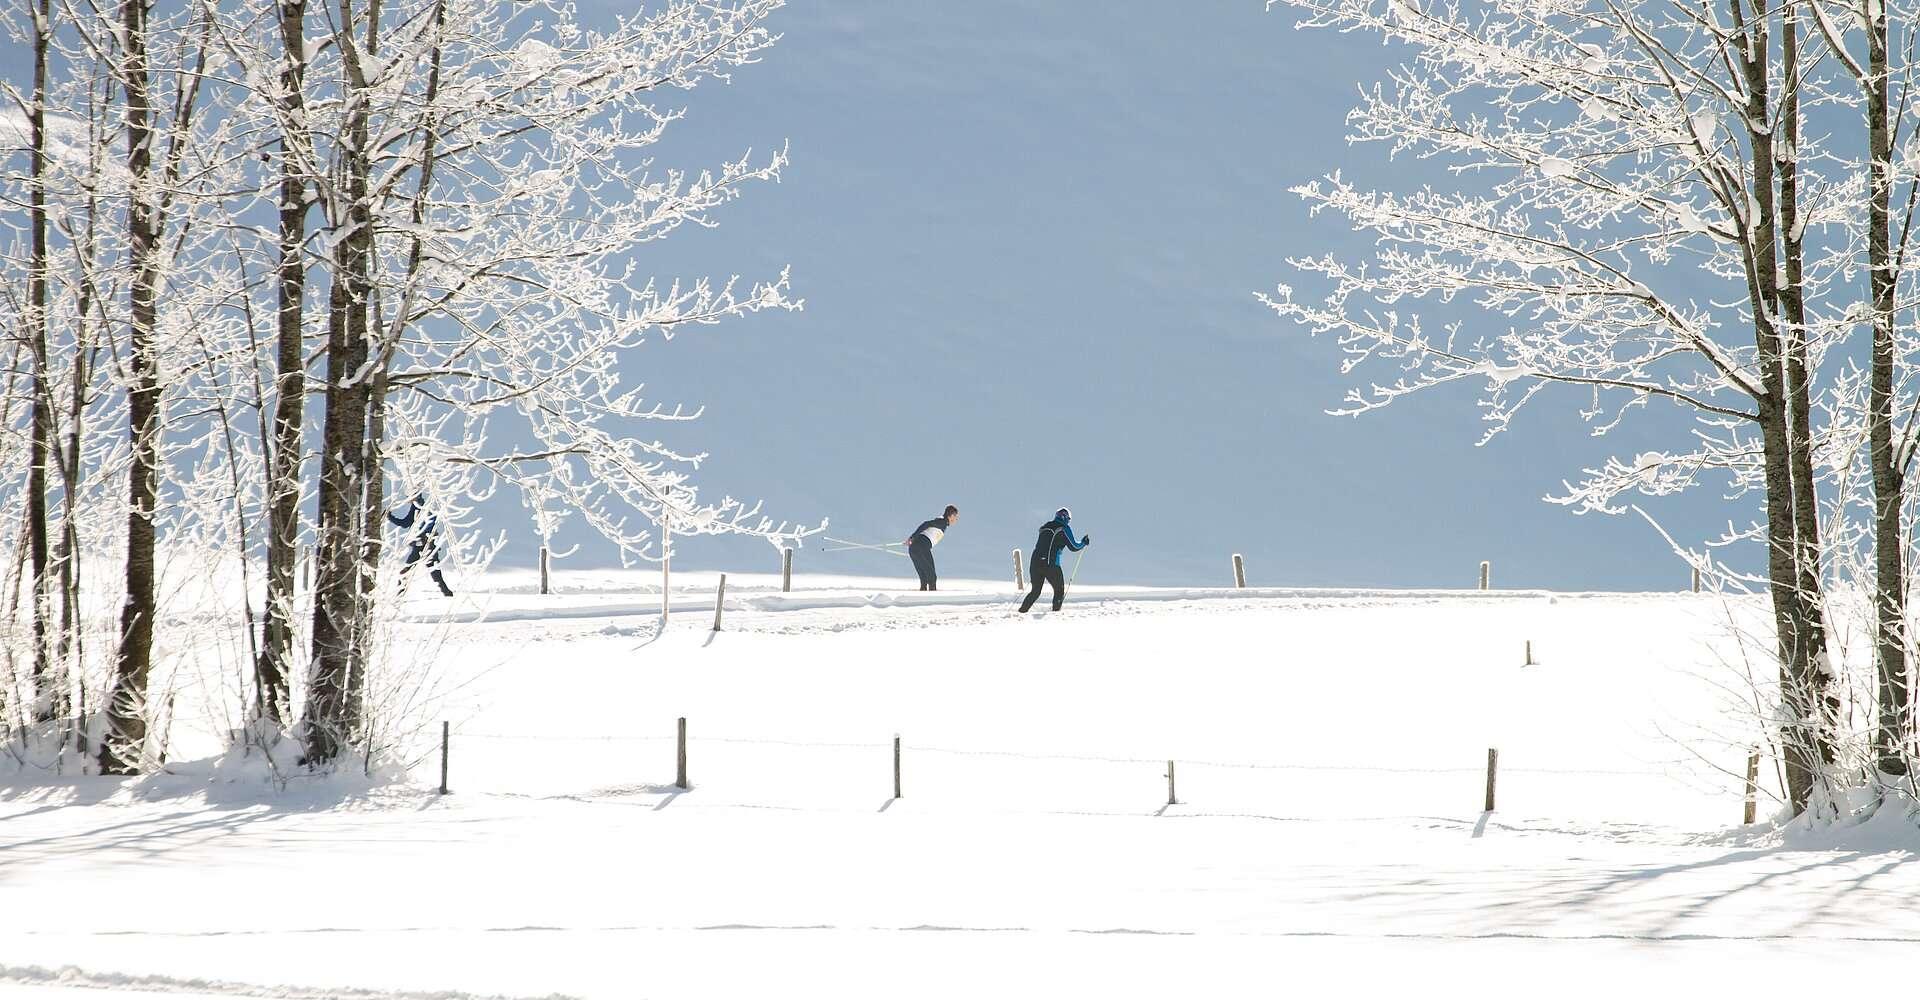 Langlaufen in der Steiermark - Loipen entdecken